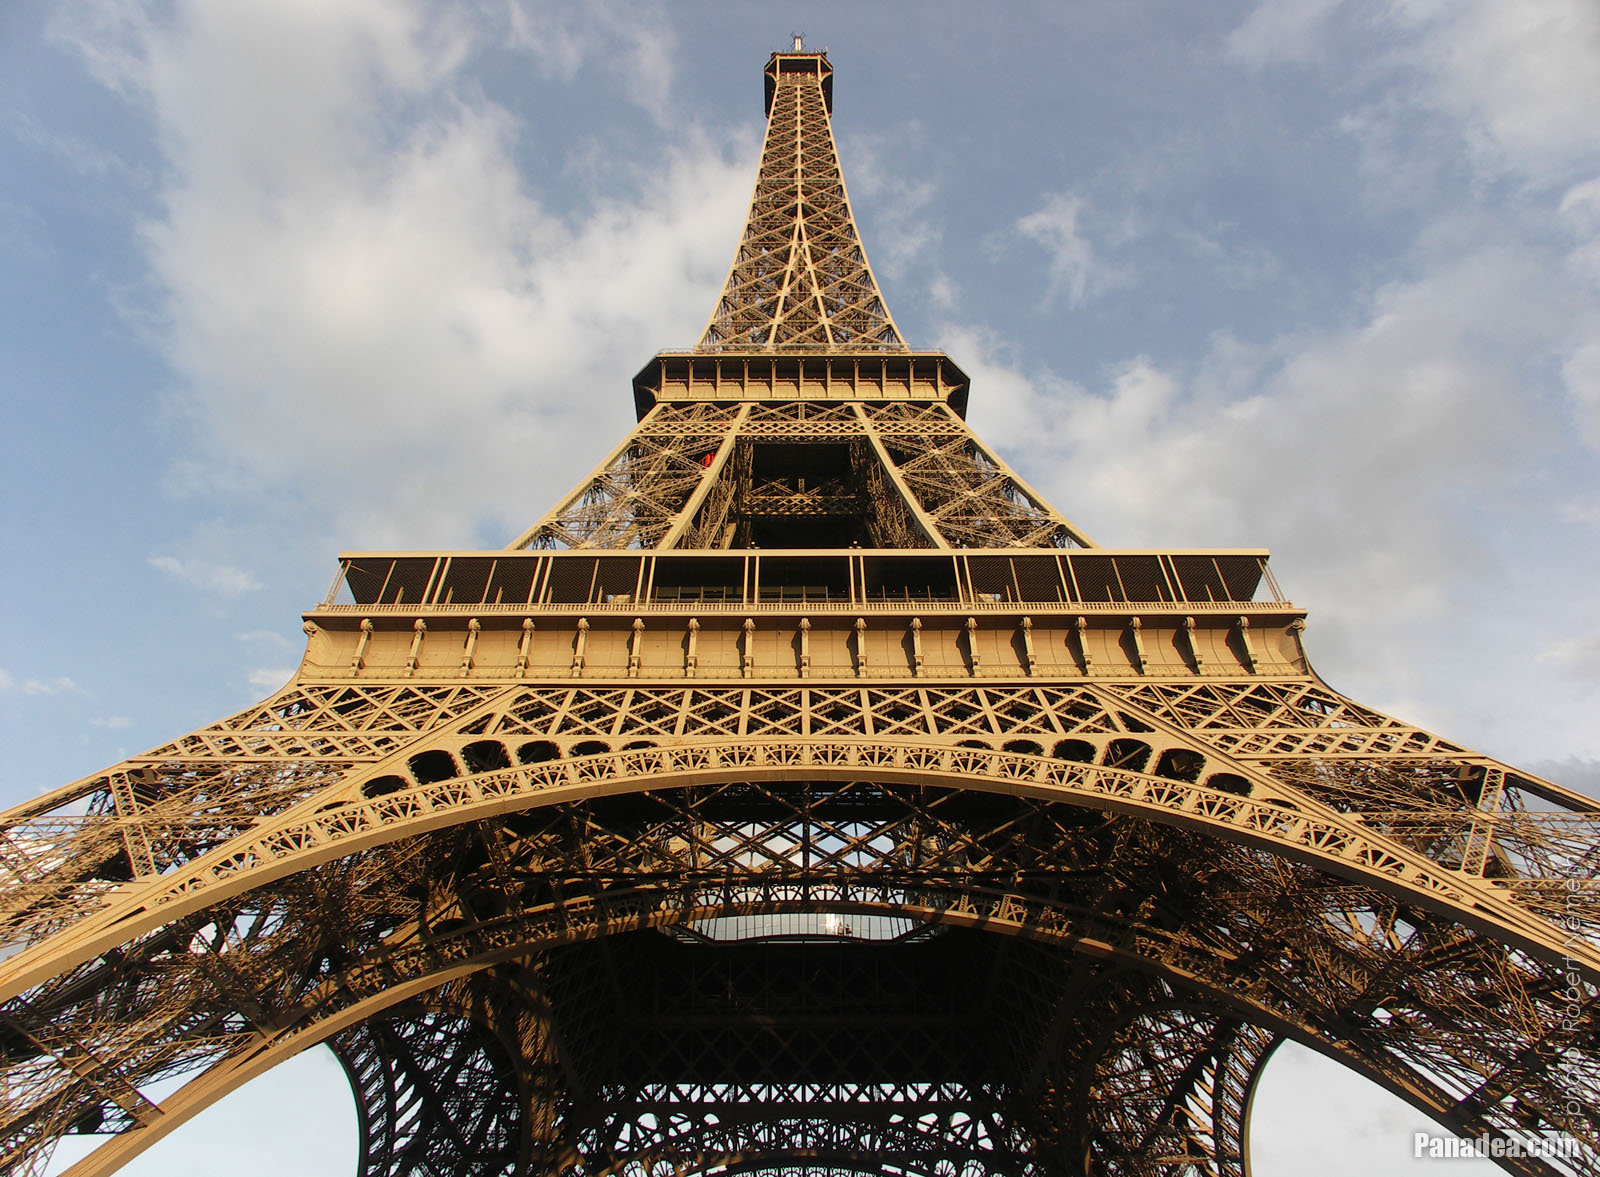 بالصور صور لبرج ايفل , اجمل صور لبرح ايفل بفرنسا 3314 18